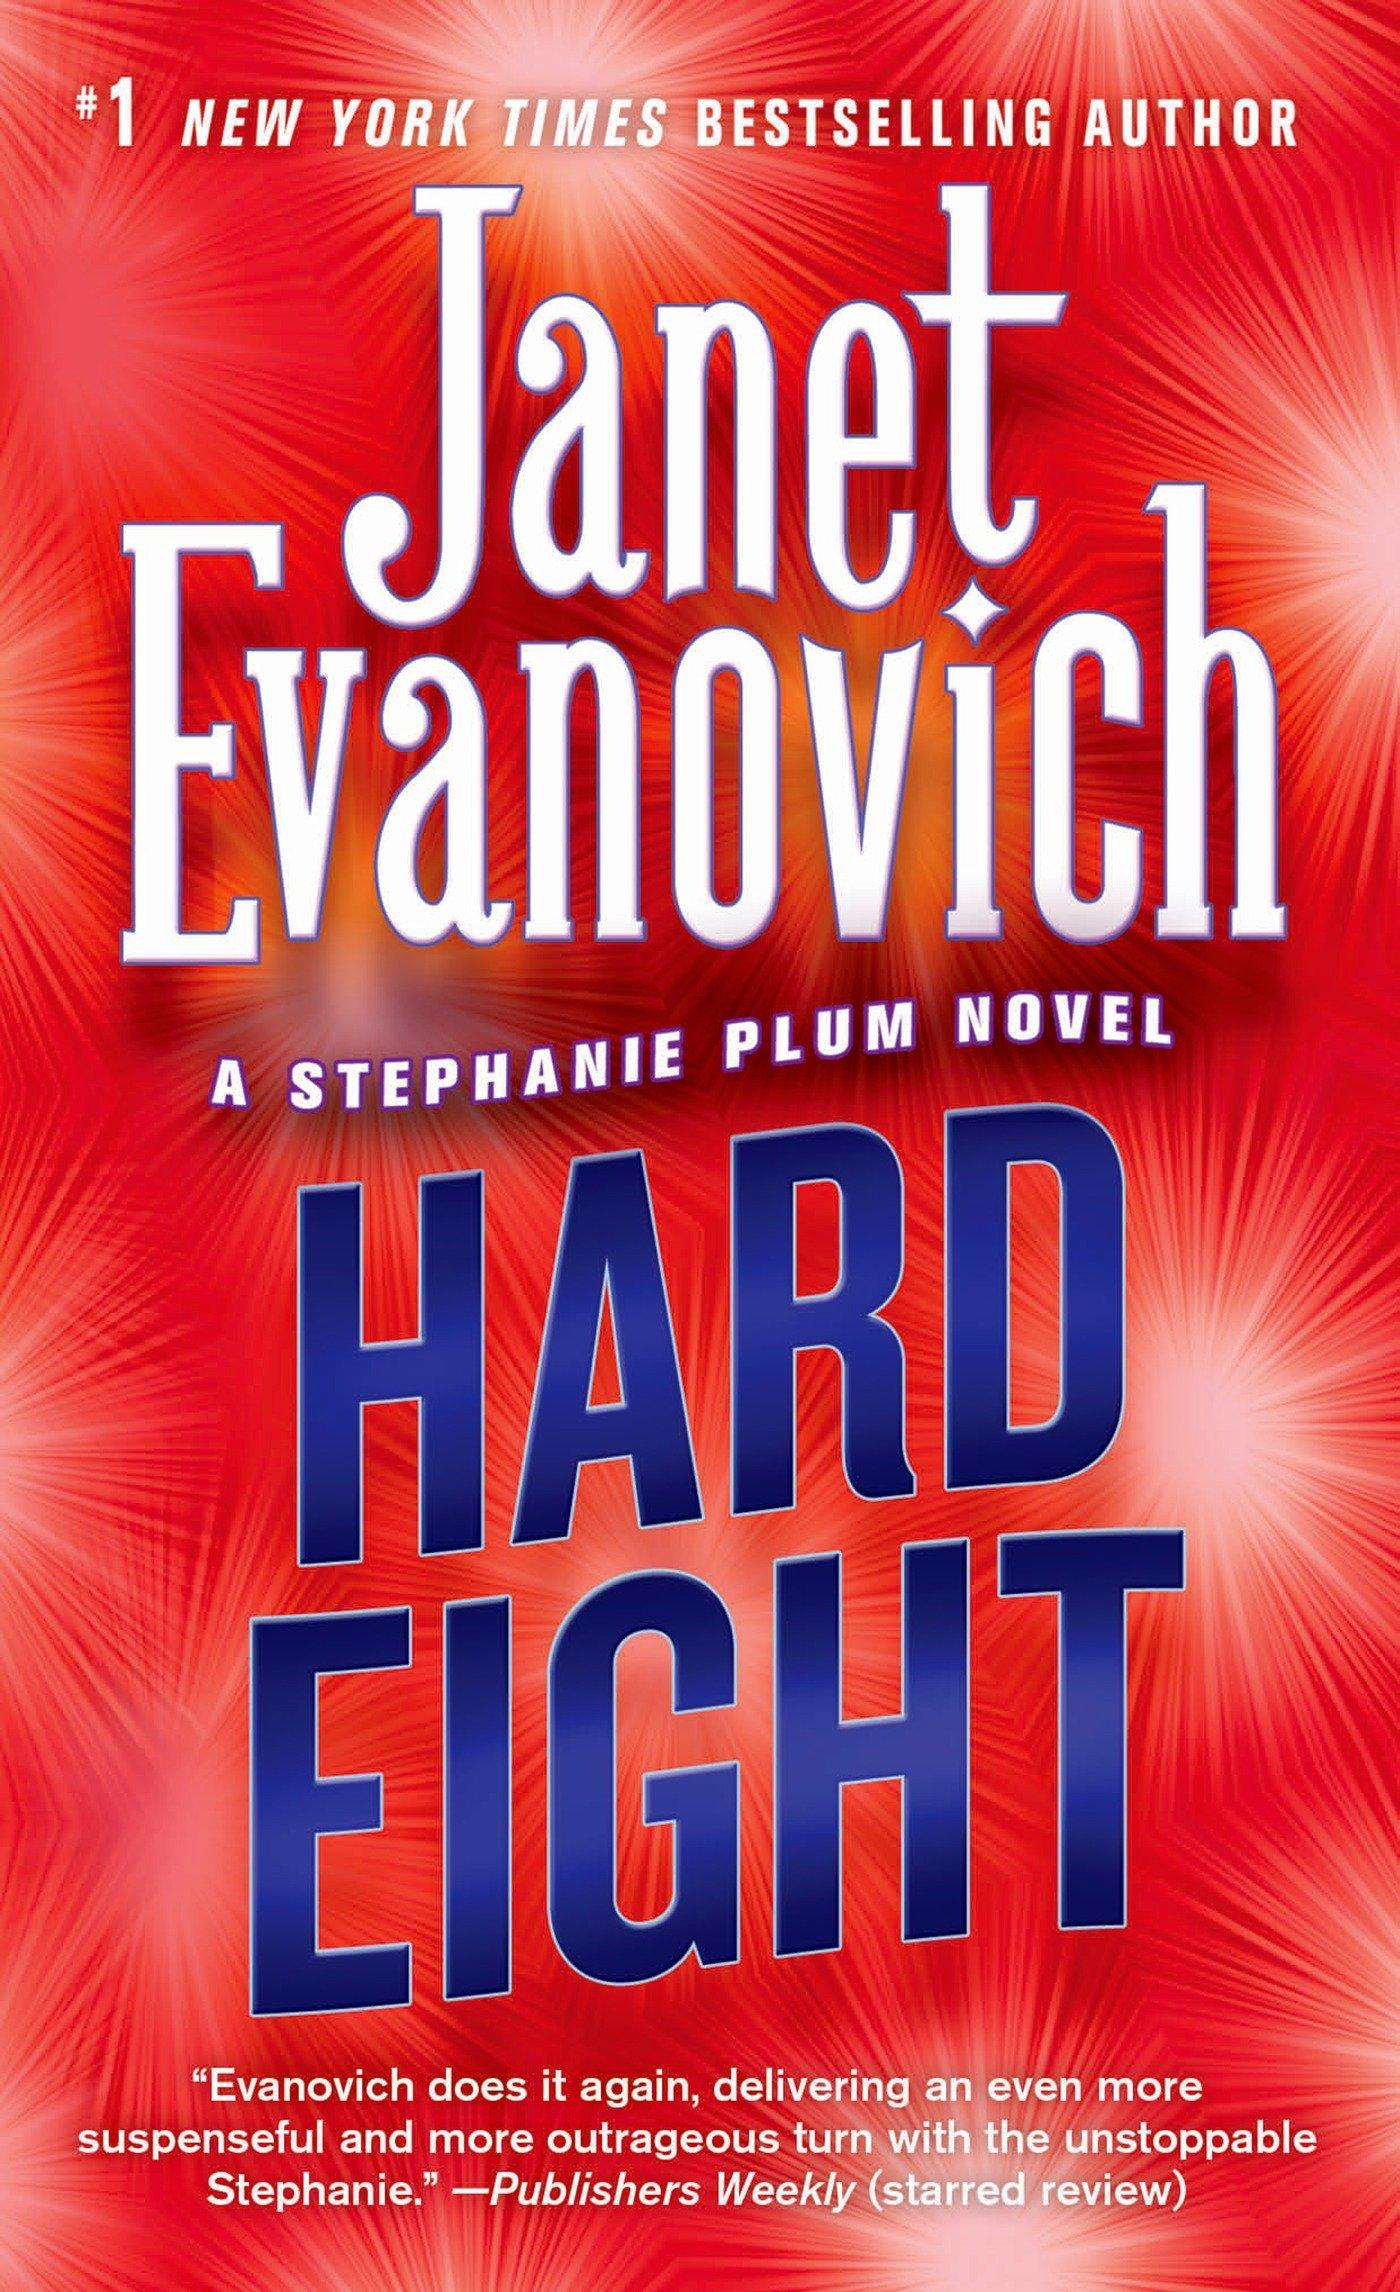 Amazon: Hard Eight (stephanie Plum, No 8) (stephanie Plum Novels)  (9780312983864): Janet Evanovich: Books